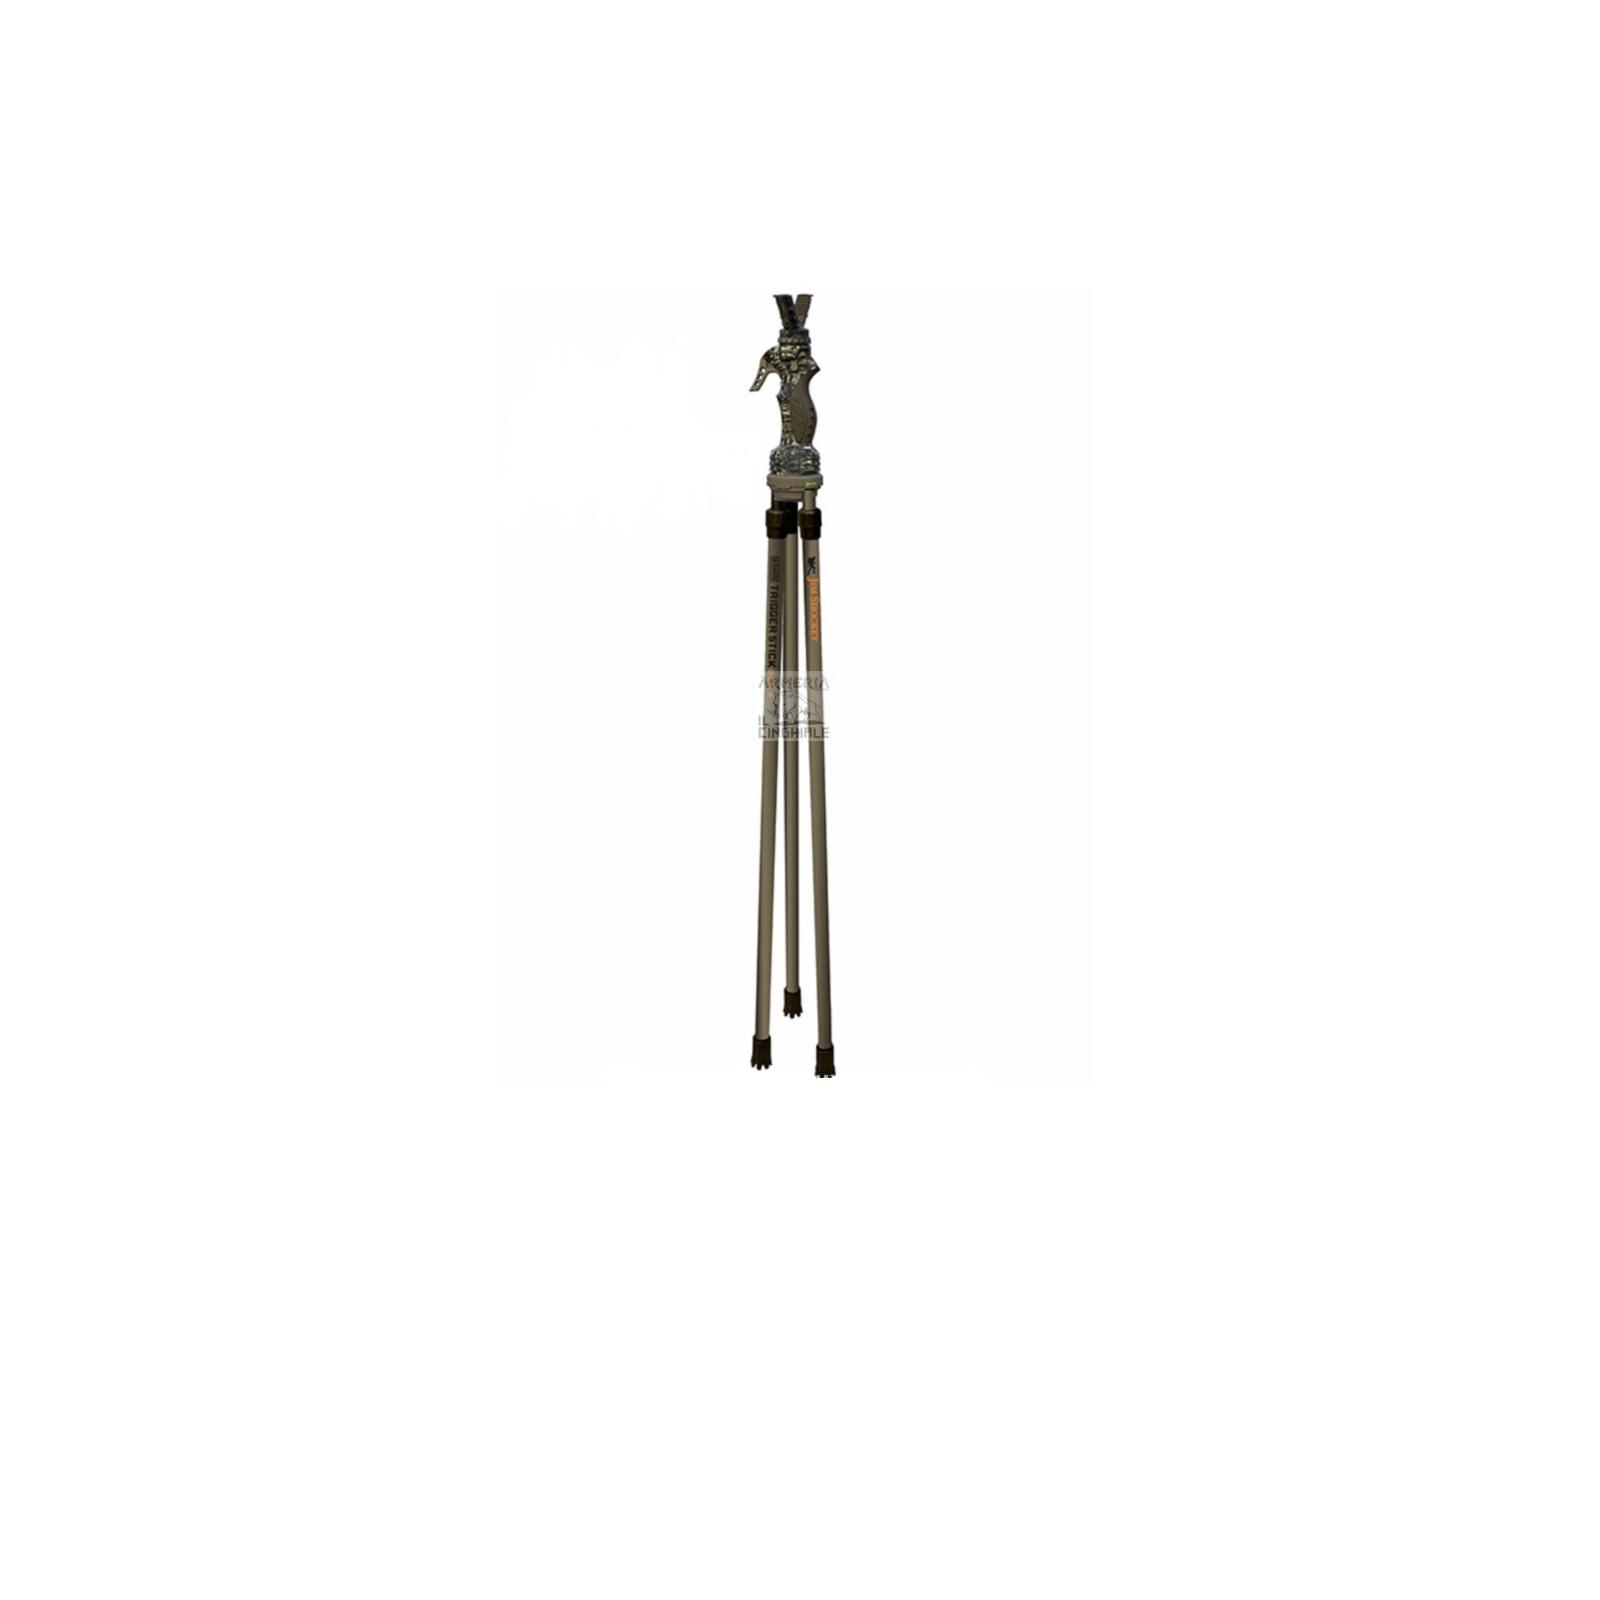 Primos Trigger Stick gen3 62″